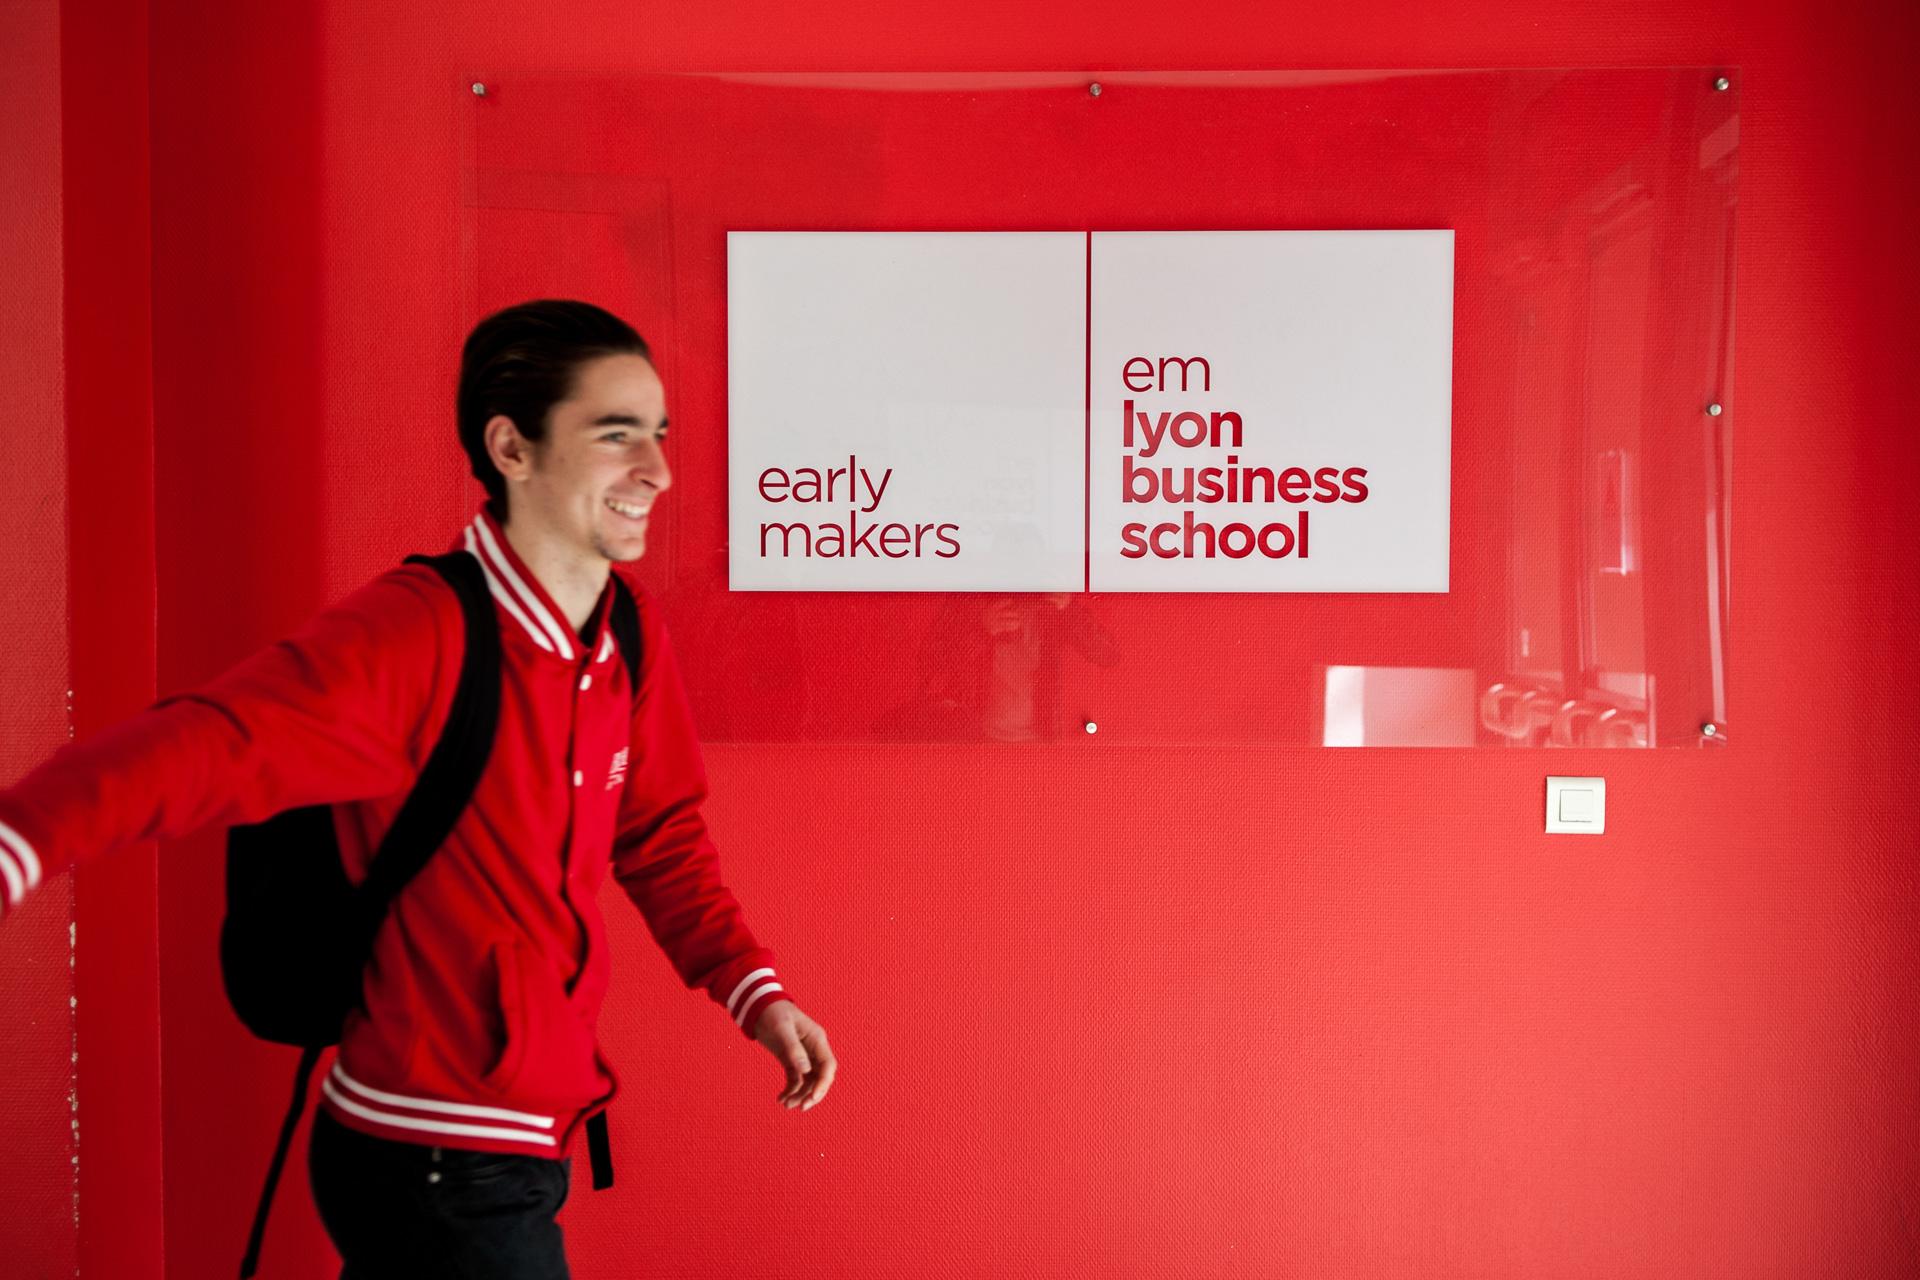 EM BUSINESS SCHOOL / ROMAIN ETIENNE